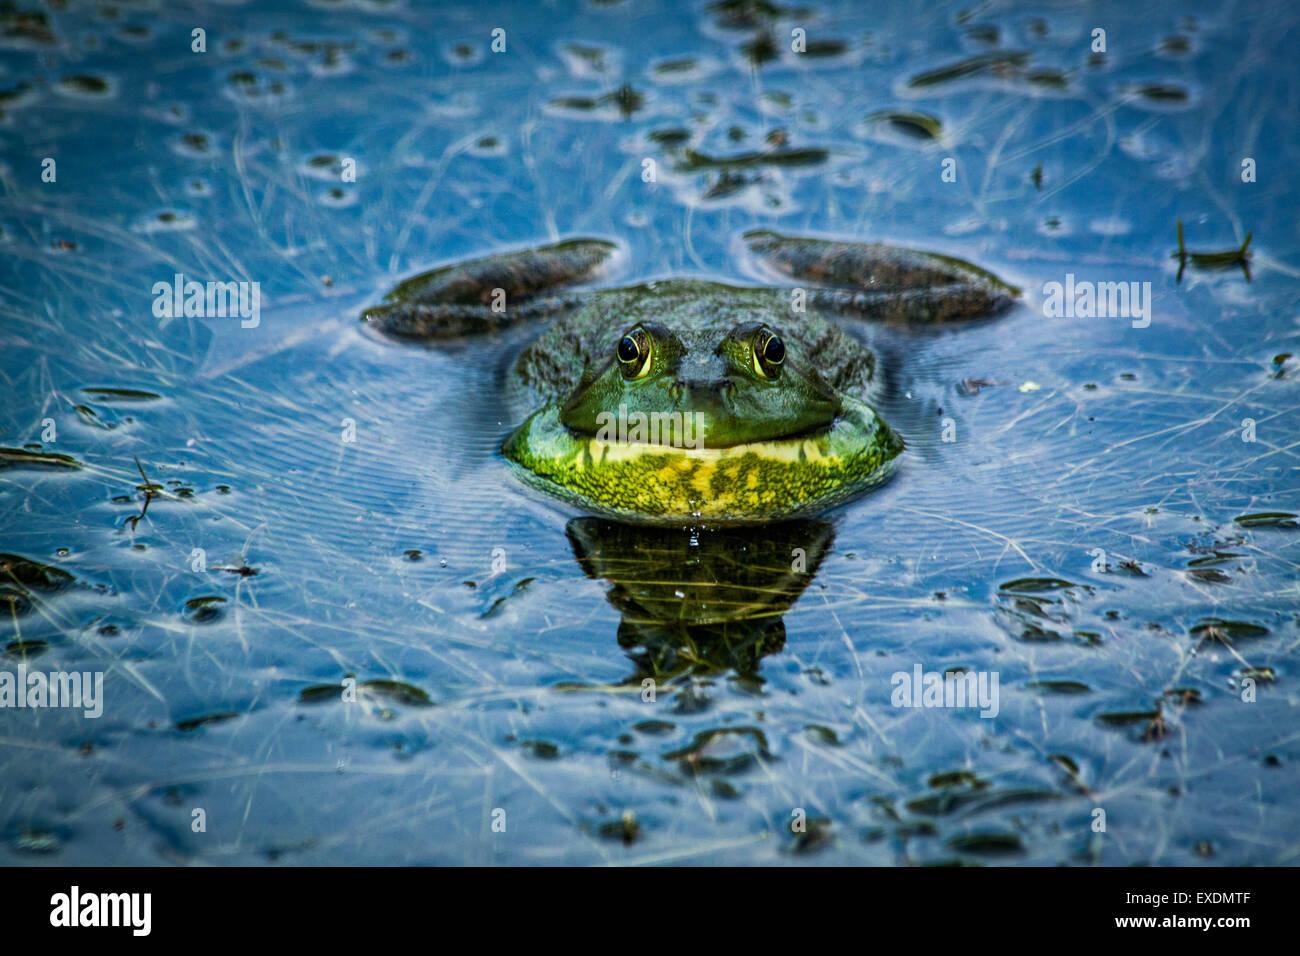 Le ouaouaron (Rana catesbeiana), Inniswood Metro jardin, Westerville, Ohio. Banque D'Images